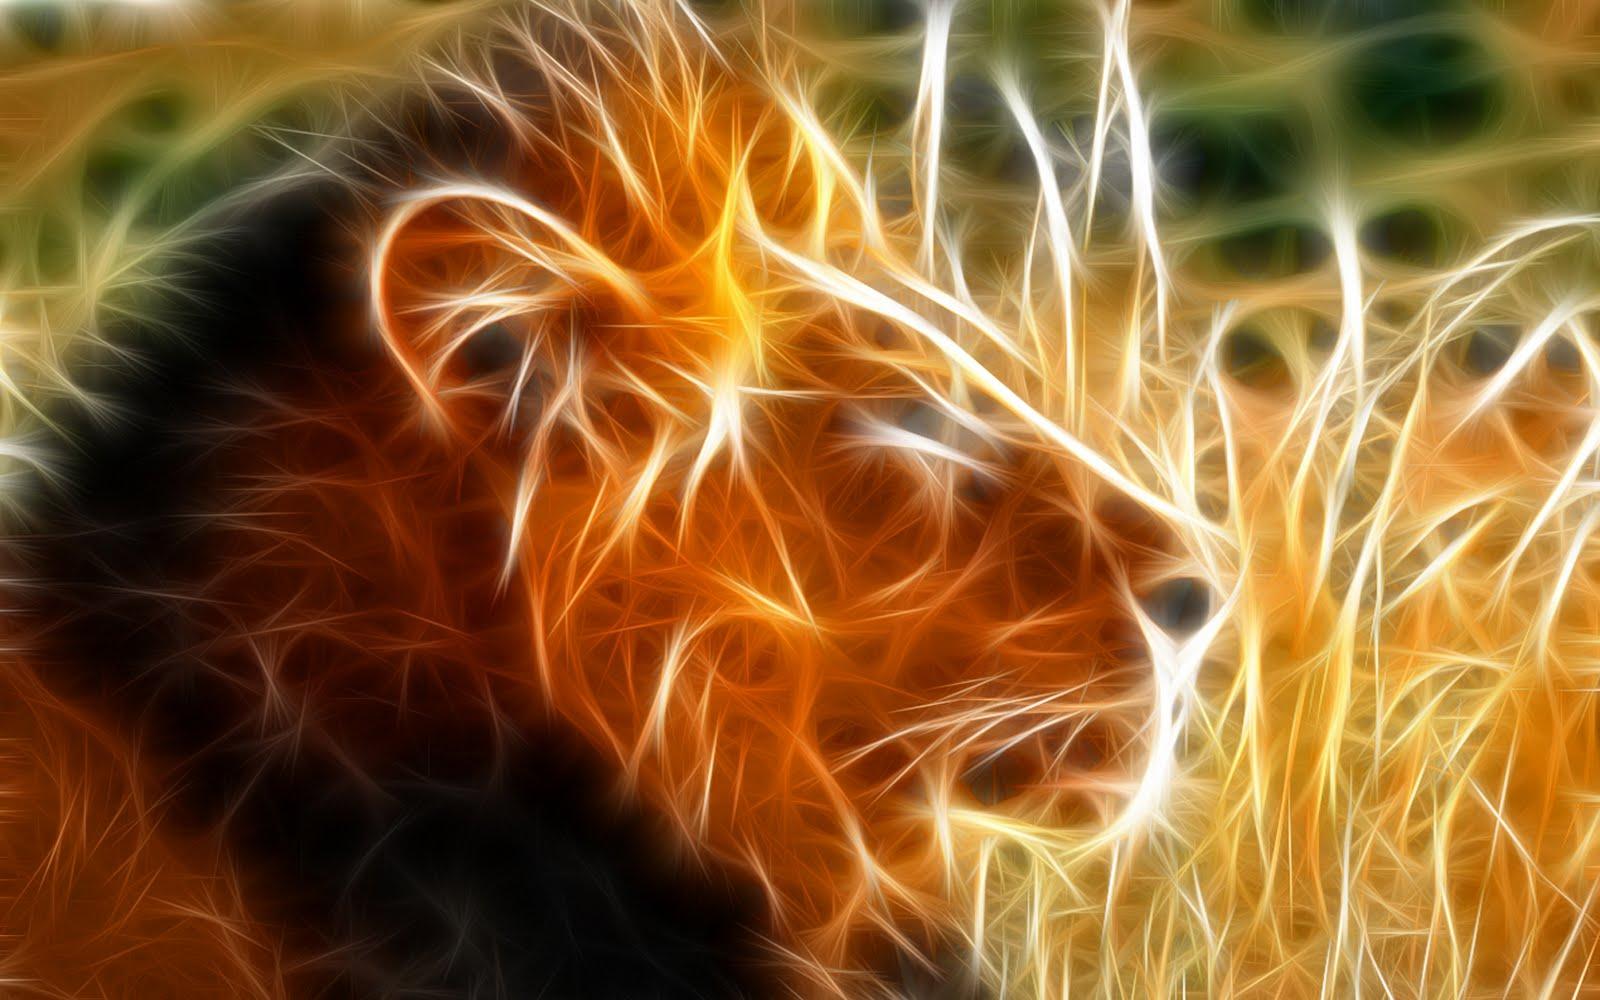 https://1.bp.blogspot.com/-hQTRua16inU/TaM1KsrDGXI/AAAAAAAAAVc/SpaxXPkQBkg/s1600/The_King_lion_hd_wallpapers.jpg